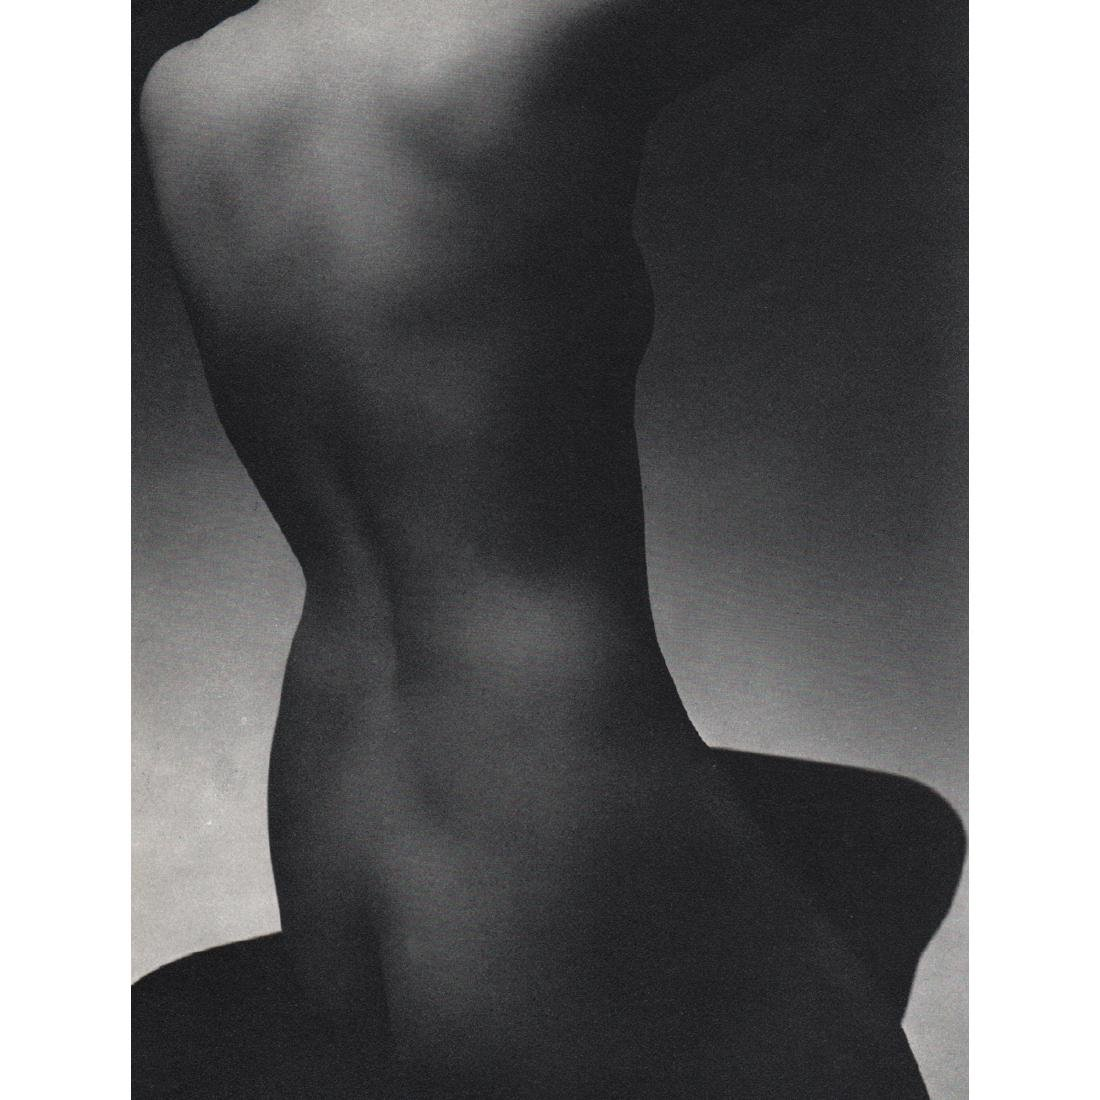 EDWARD STEICHEN - Nude Torso, 1934